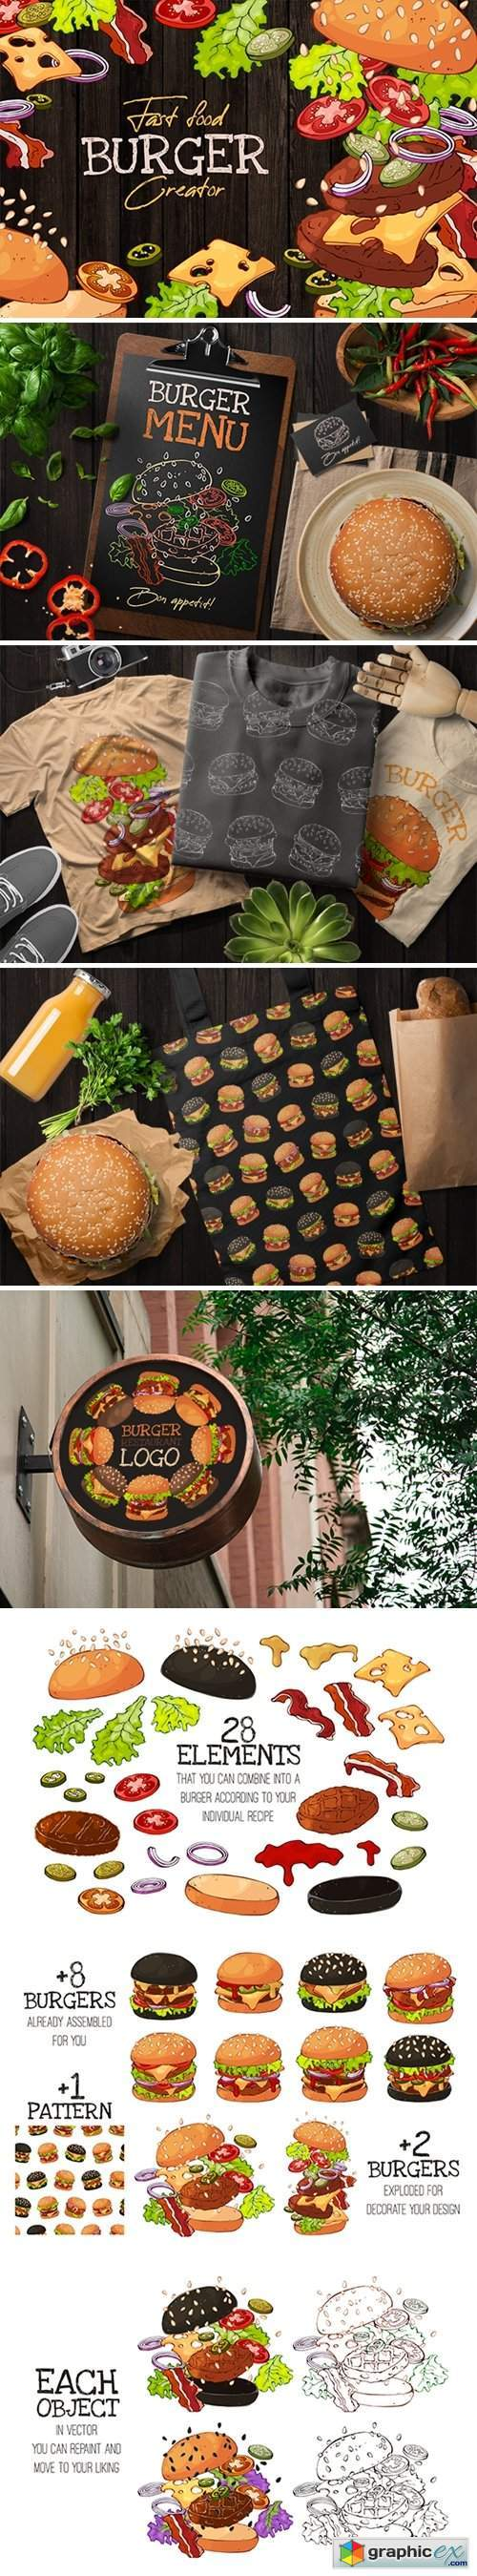 Fast Food Burger Creator